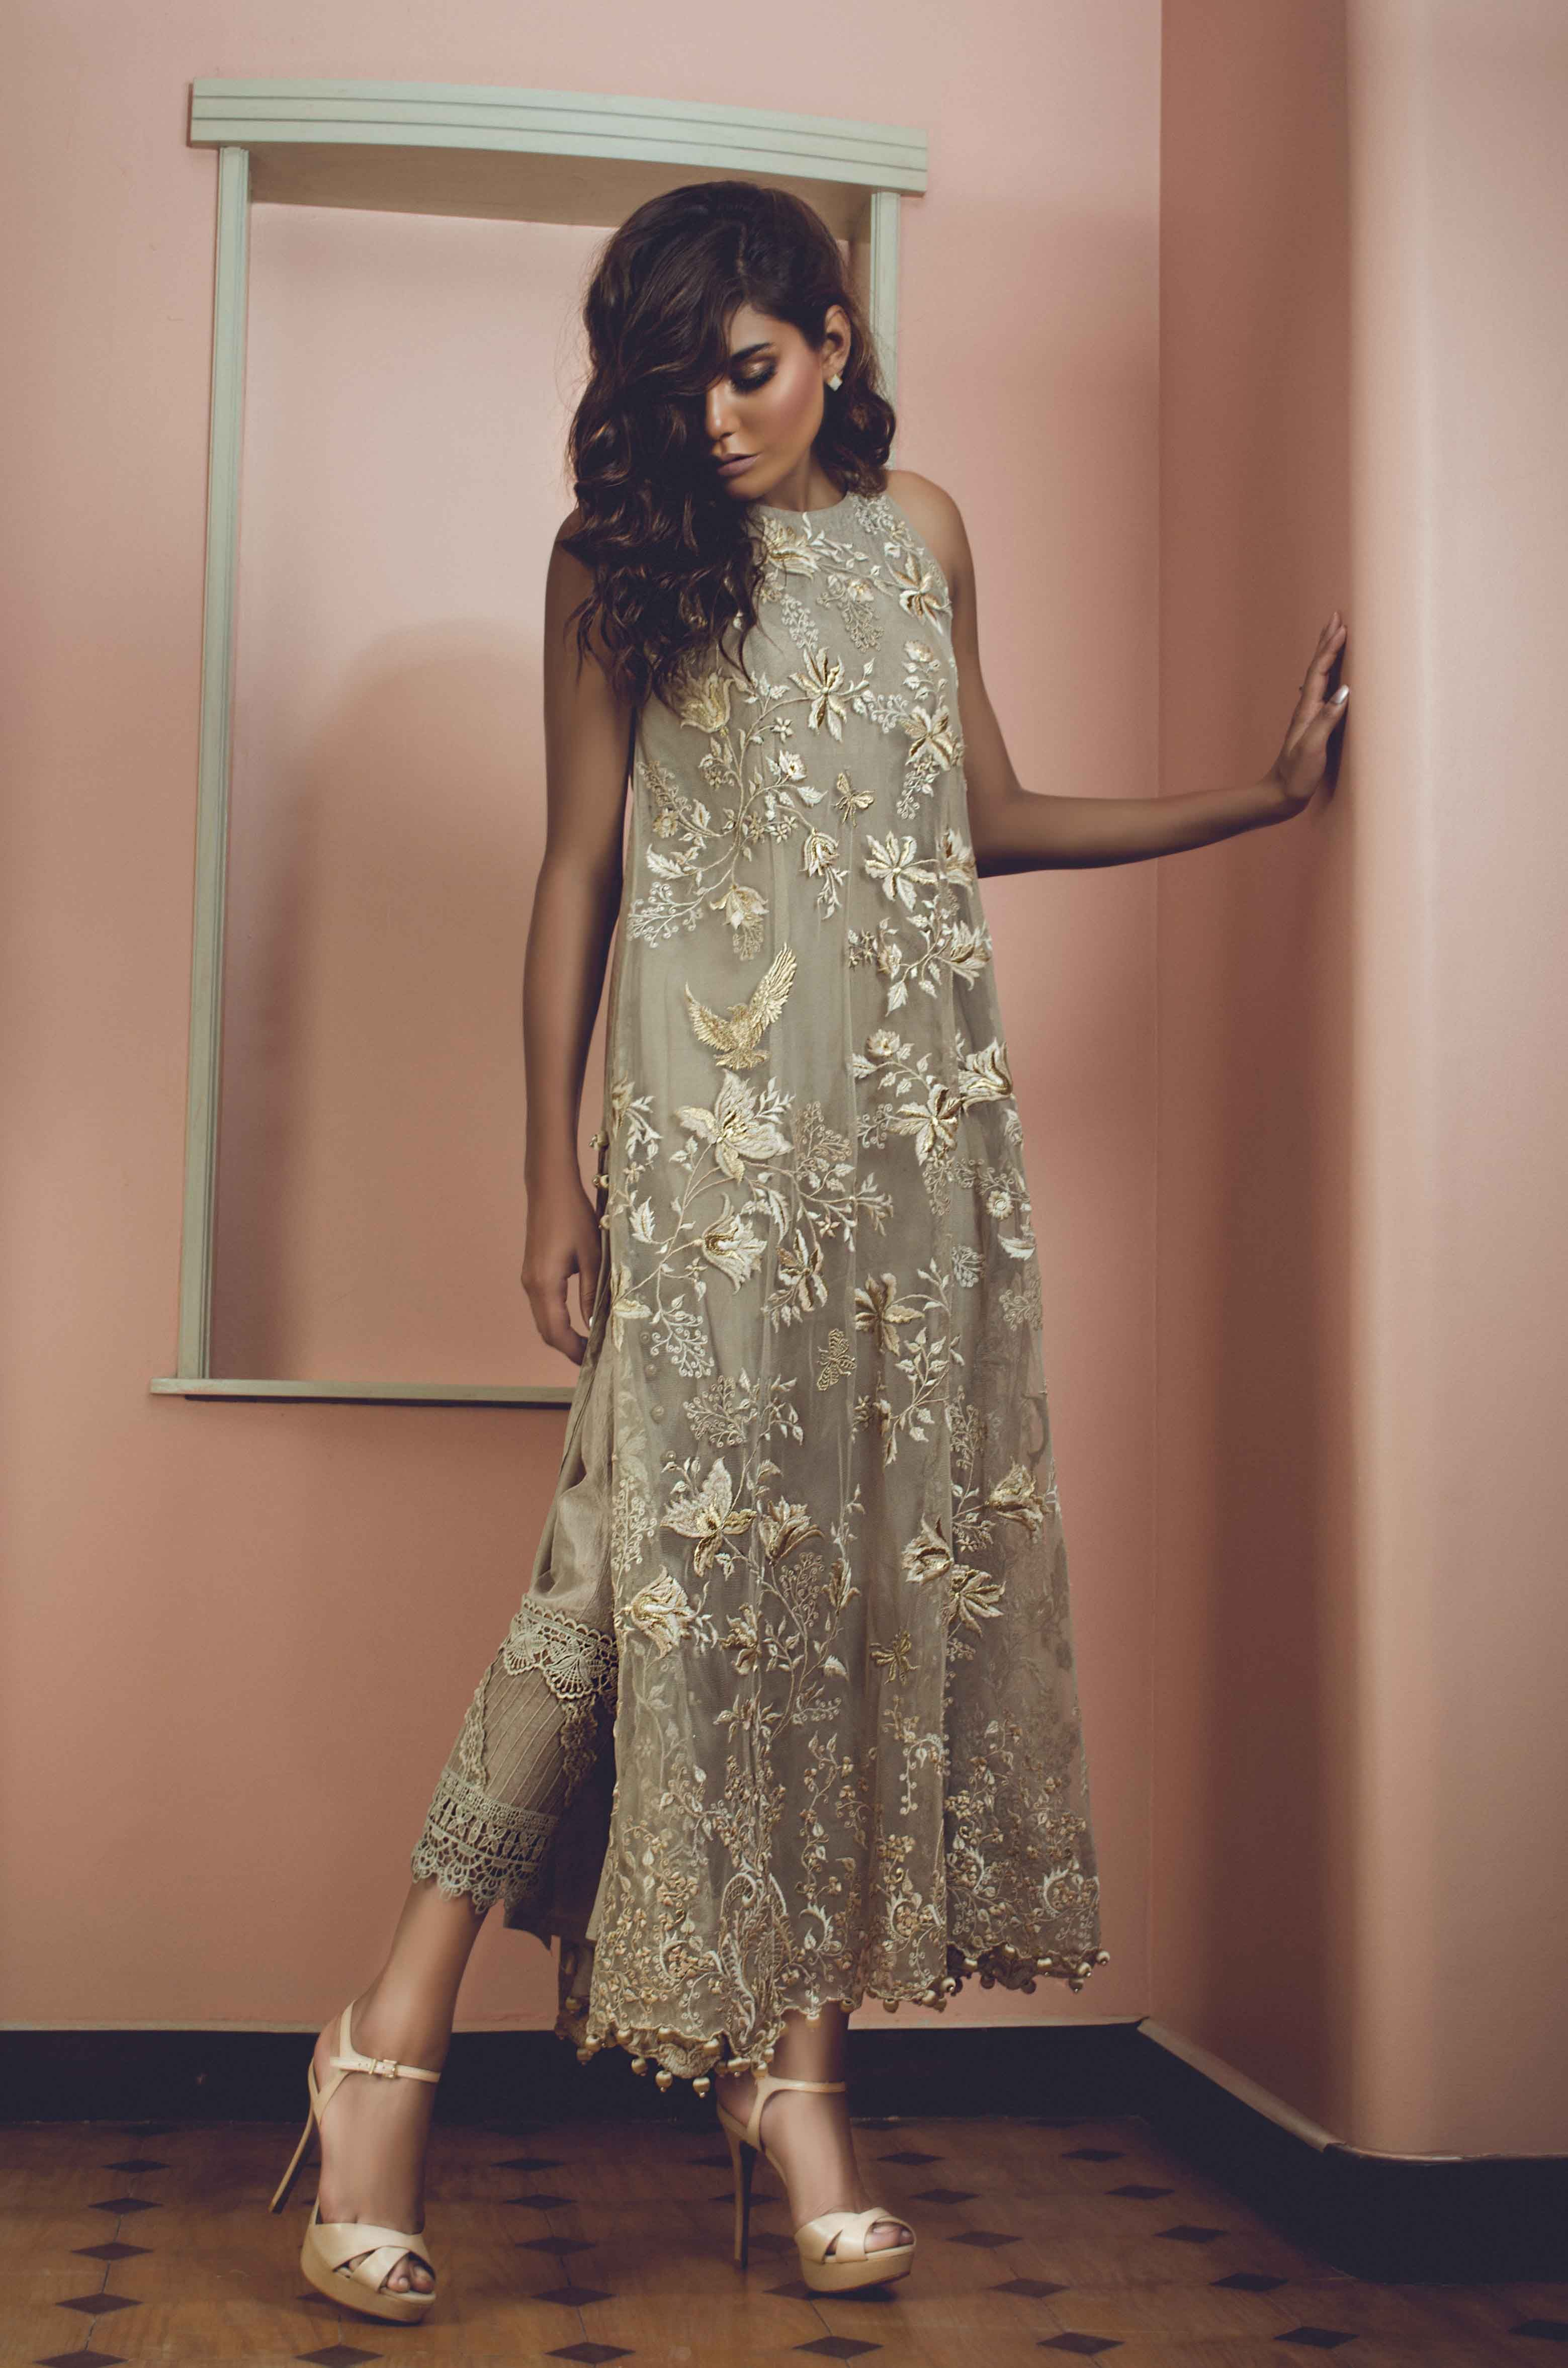 Tena Durrani Eid More Pakistan Wedding Pinterest Dresses